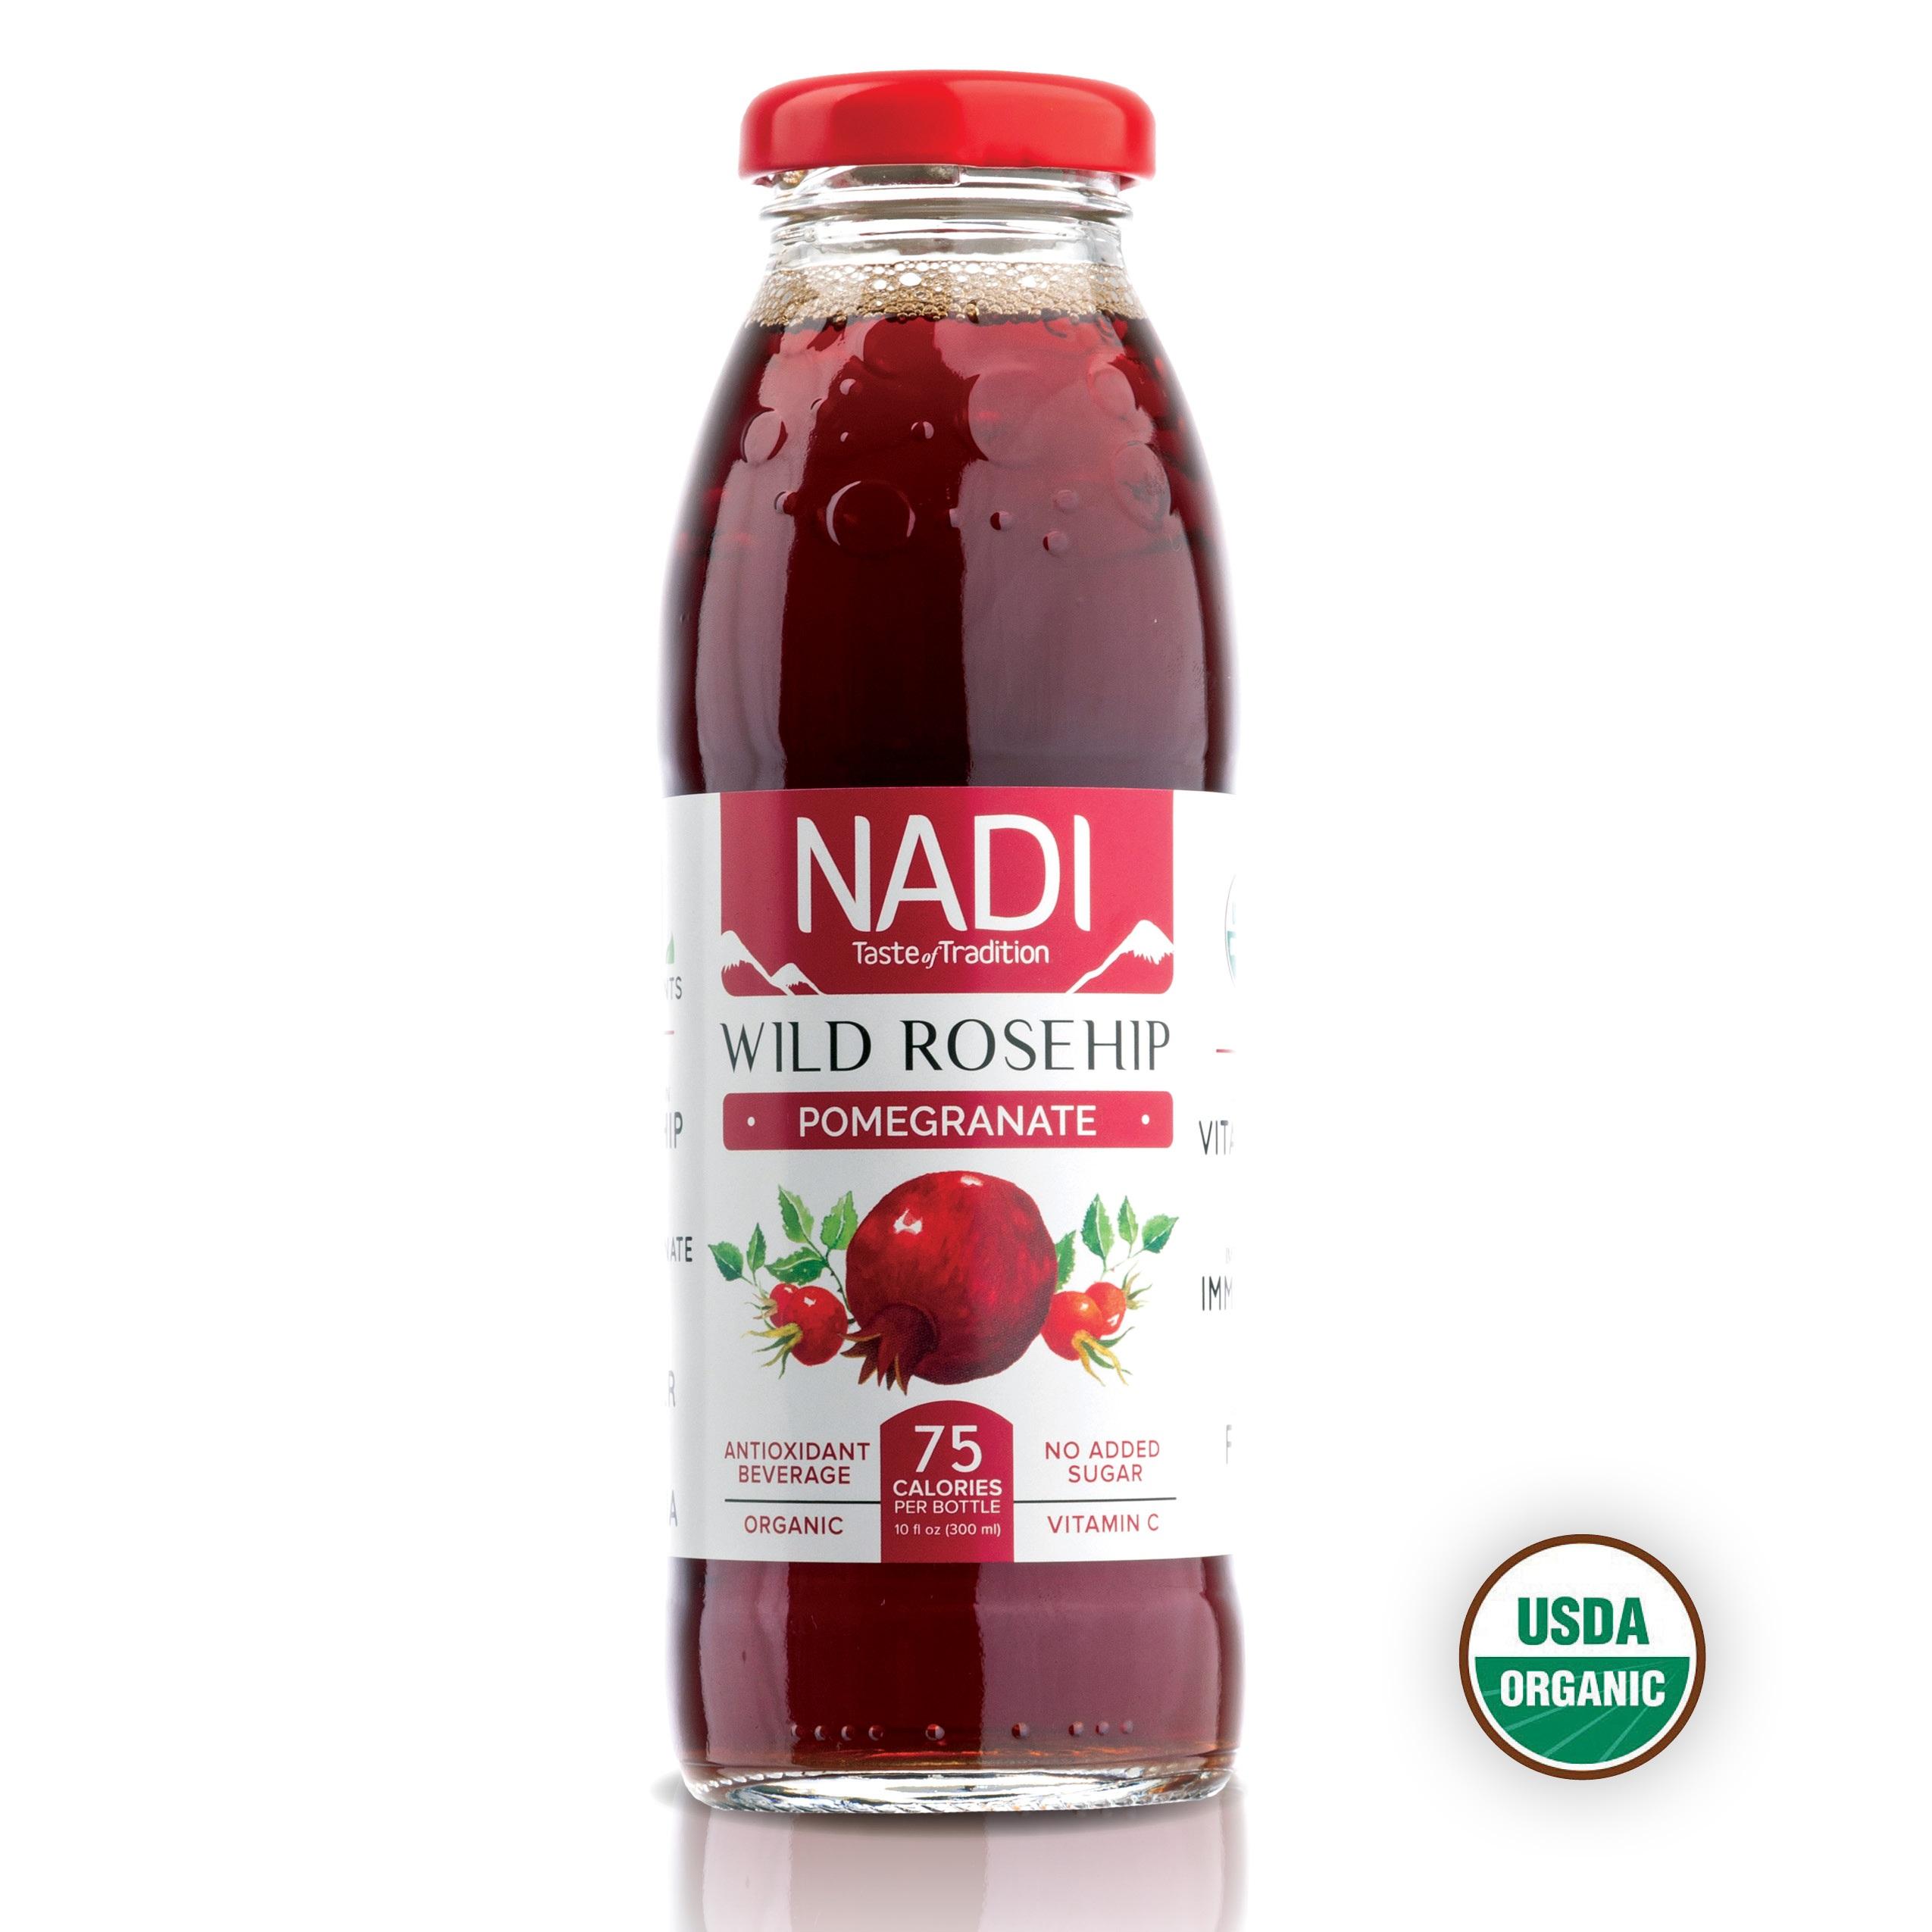 Organic Wild Rosehip Pomegranate Antioxidant Beverage